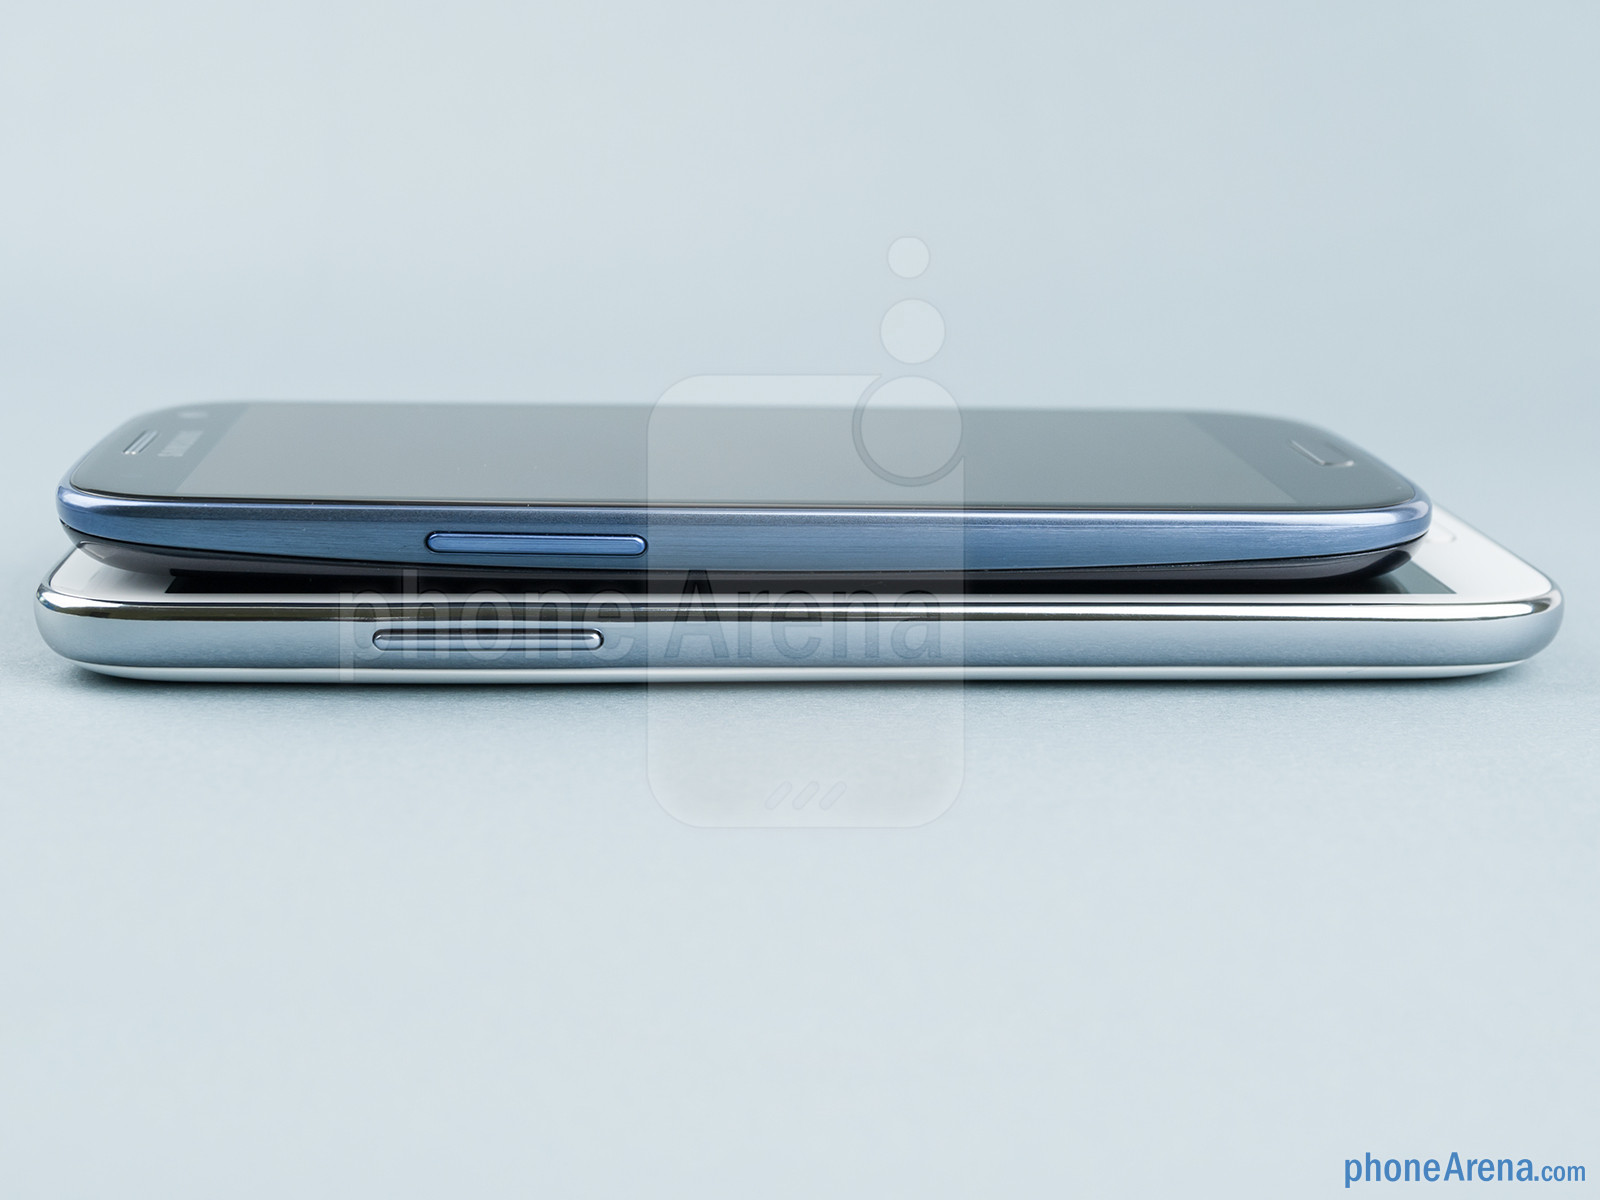 Samsung Galaxy Note 3 HD Desktop Wallpaper HD Desktop Wallpaper 1600x1200